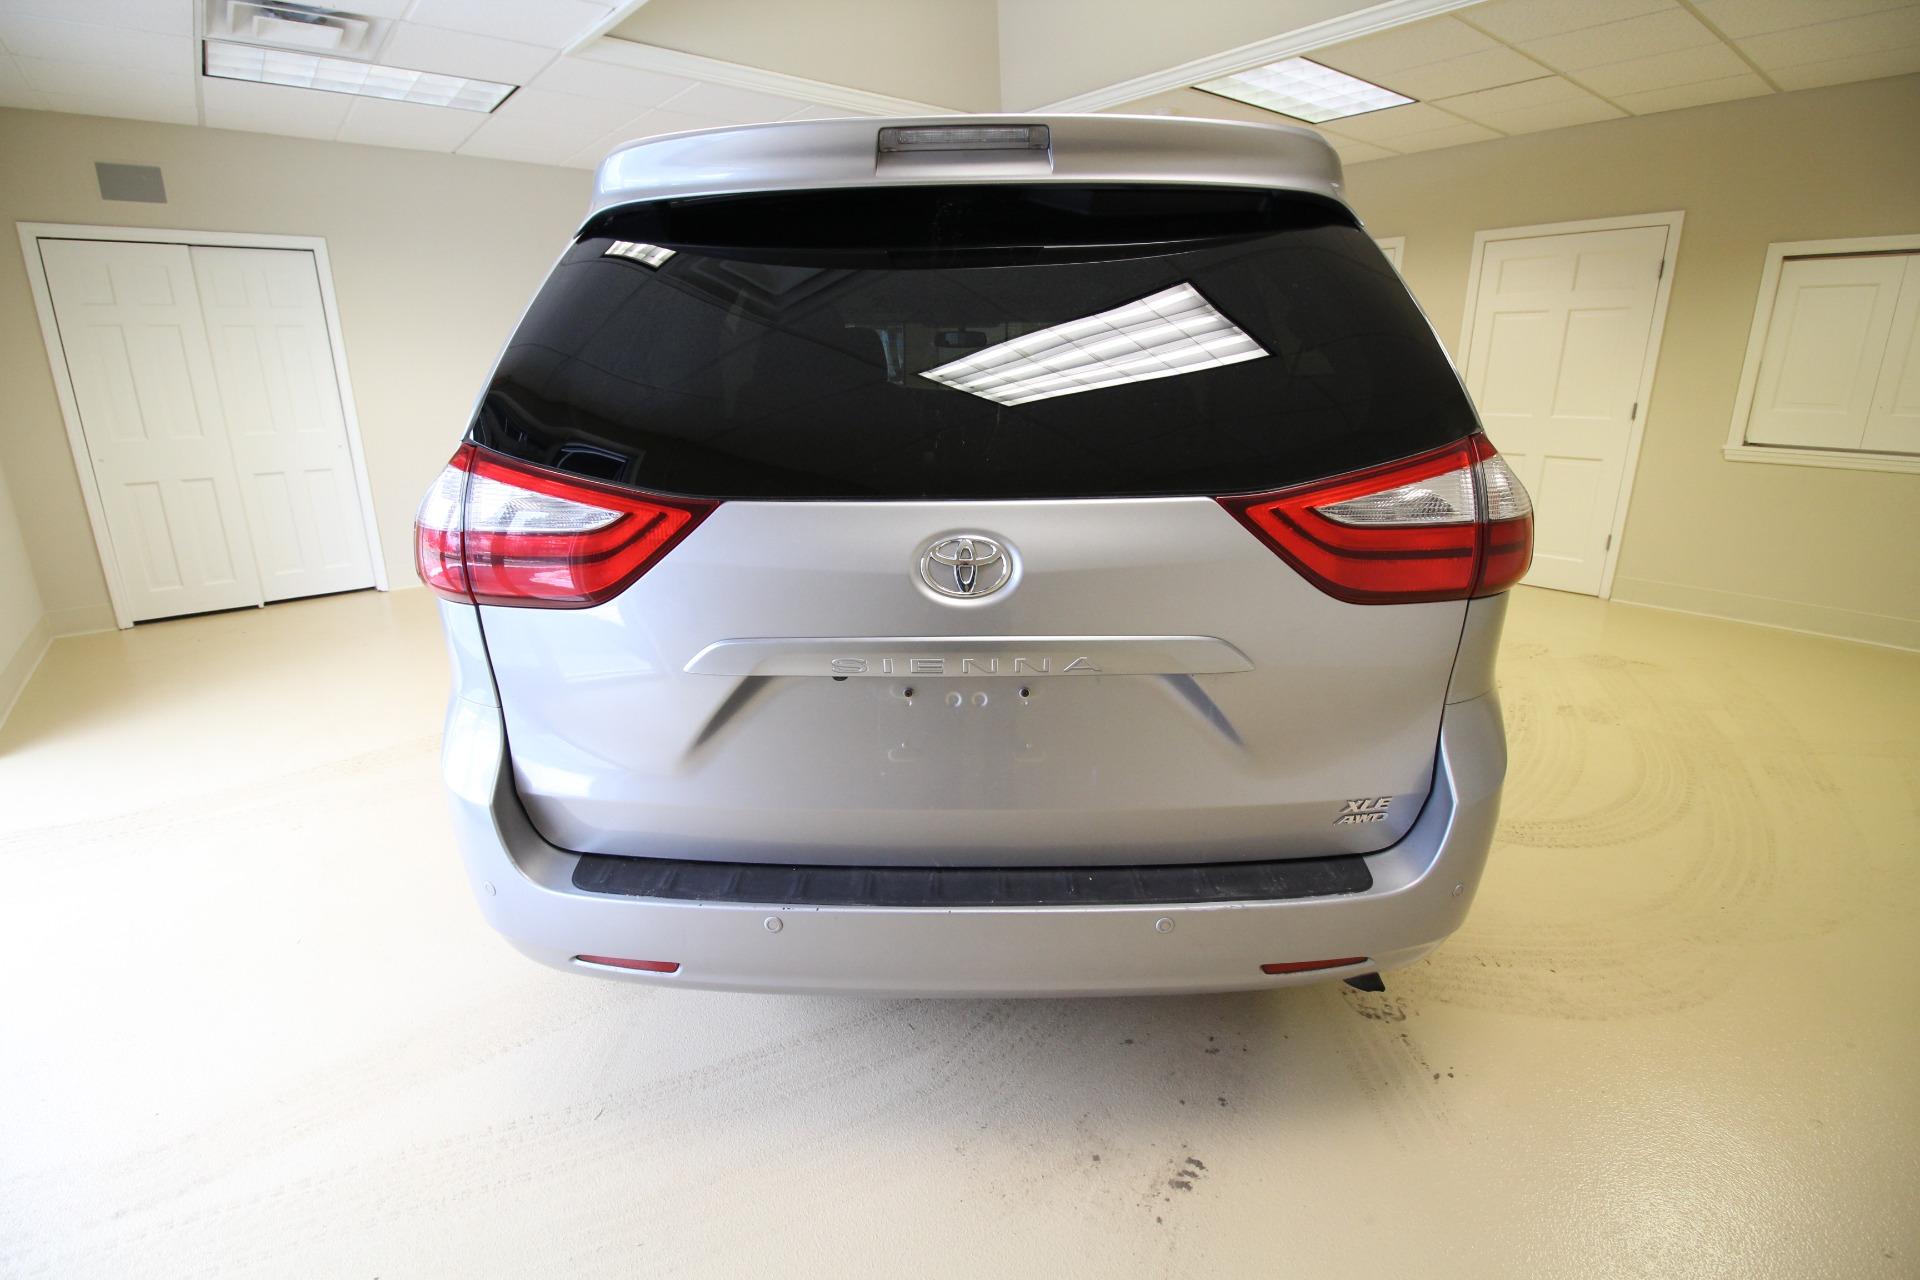 Used 2015 Toyota Sienna XLE LIMITED PREMIUM AWD 7-PASSENGER | Albany, NY